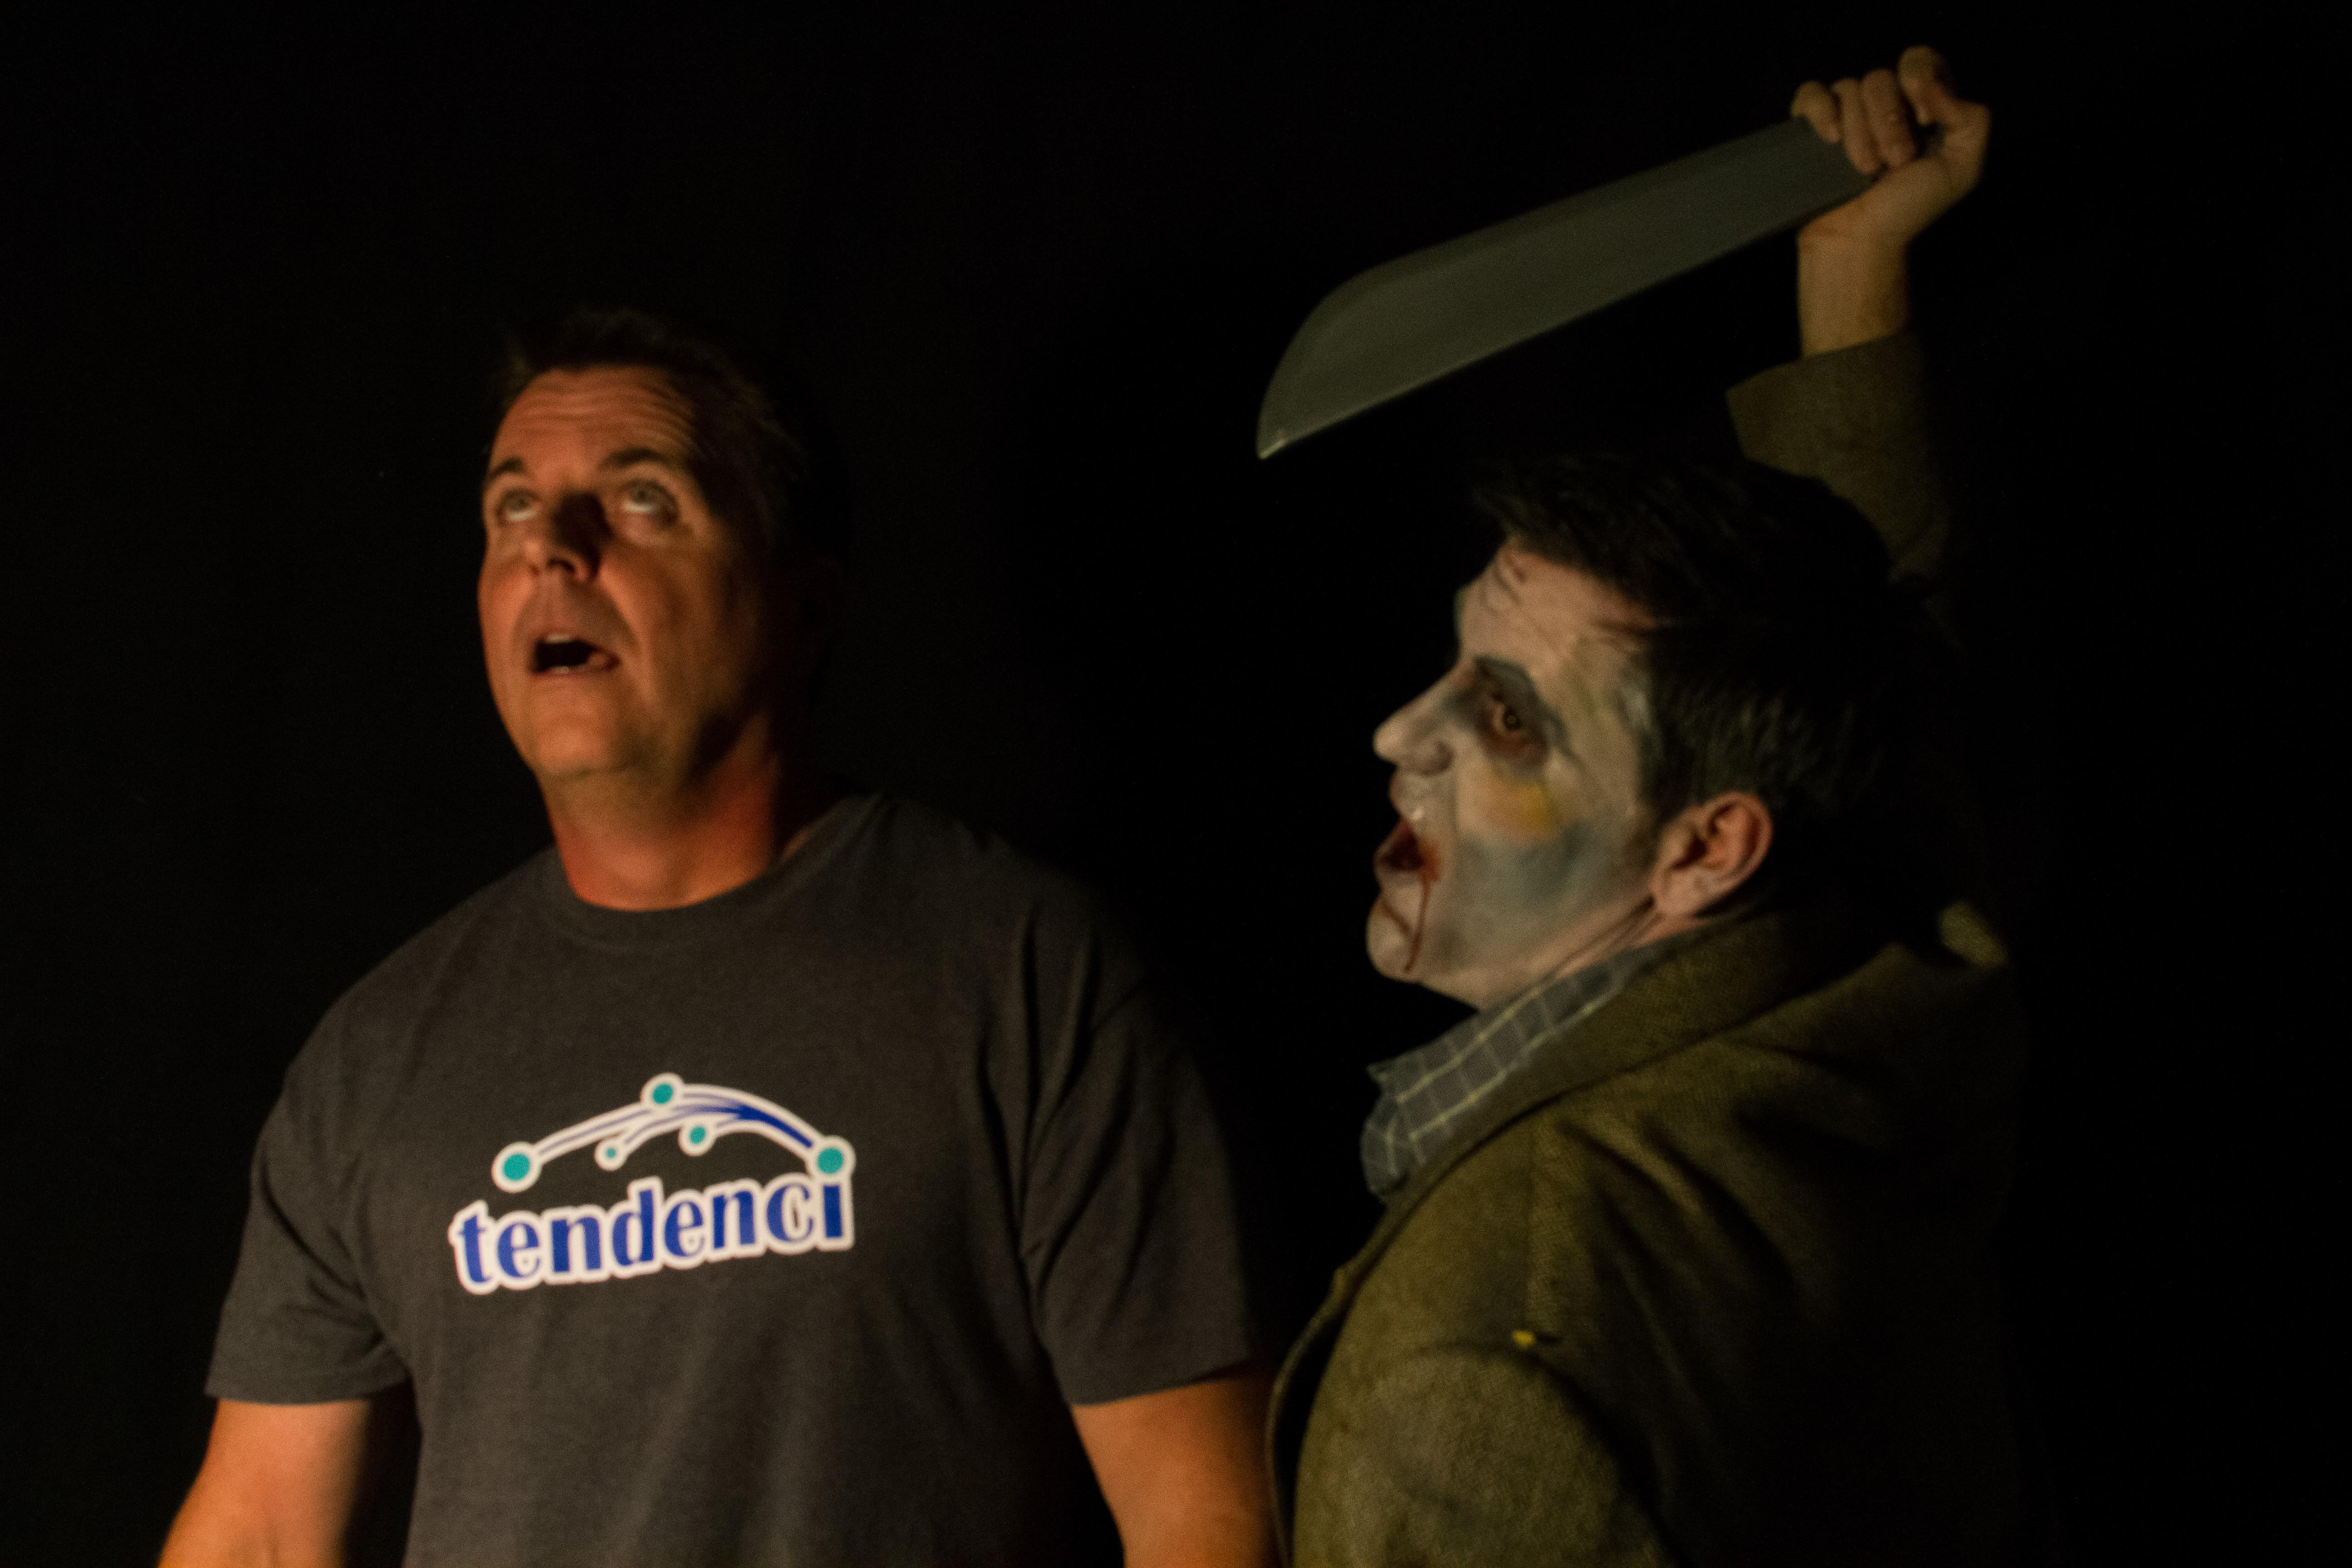 Tendenci Zombie Photos 2013 - 25